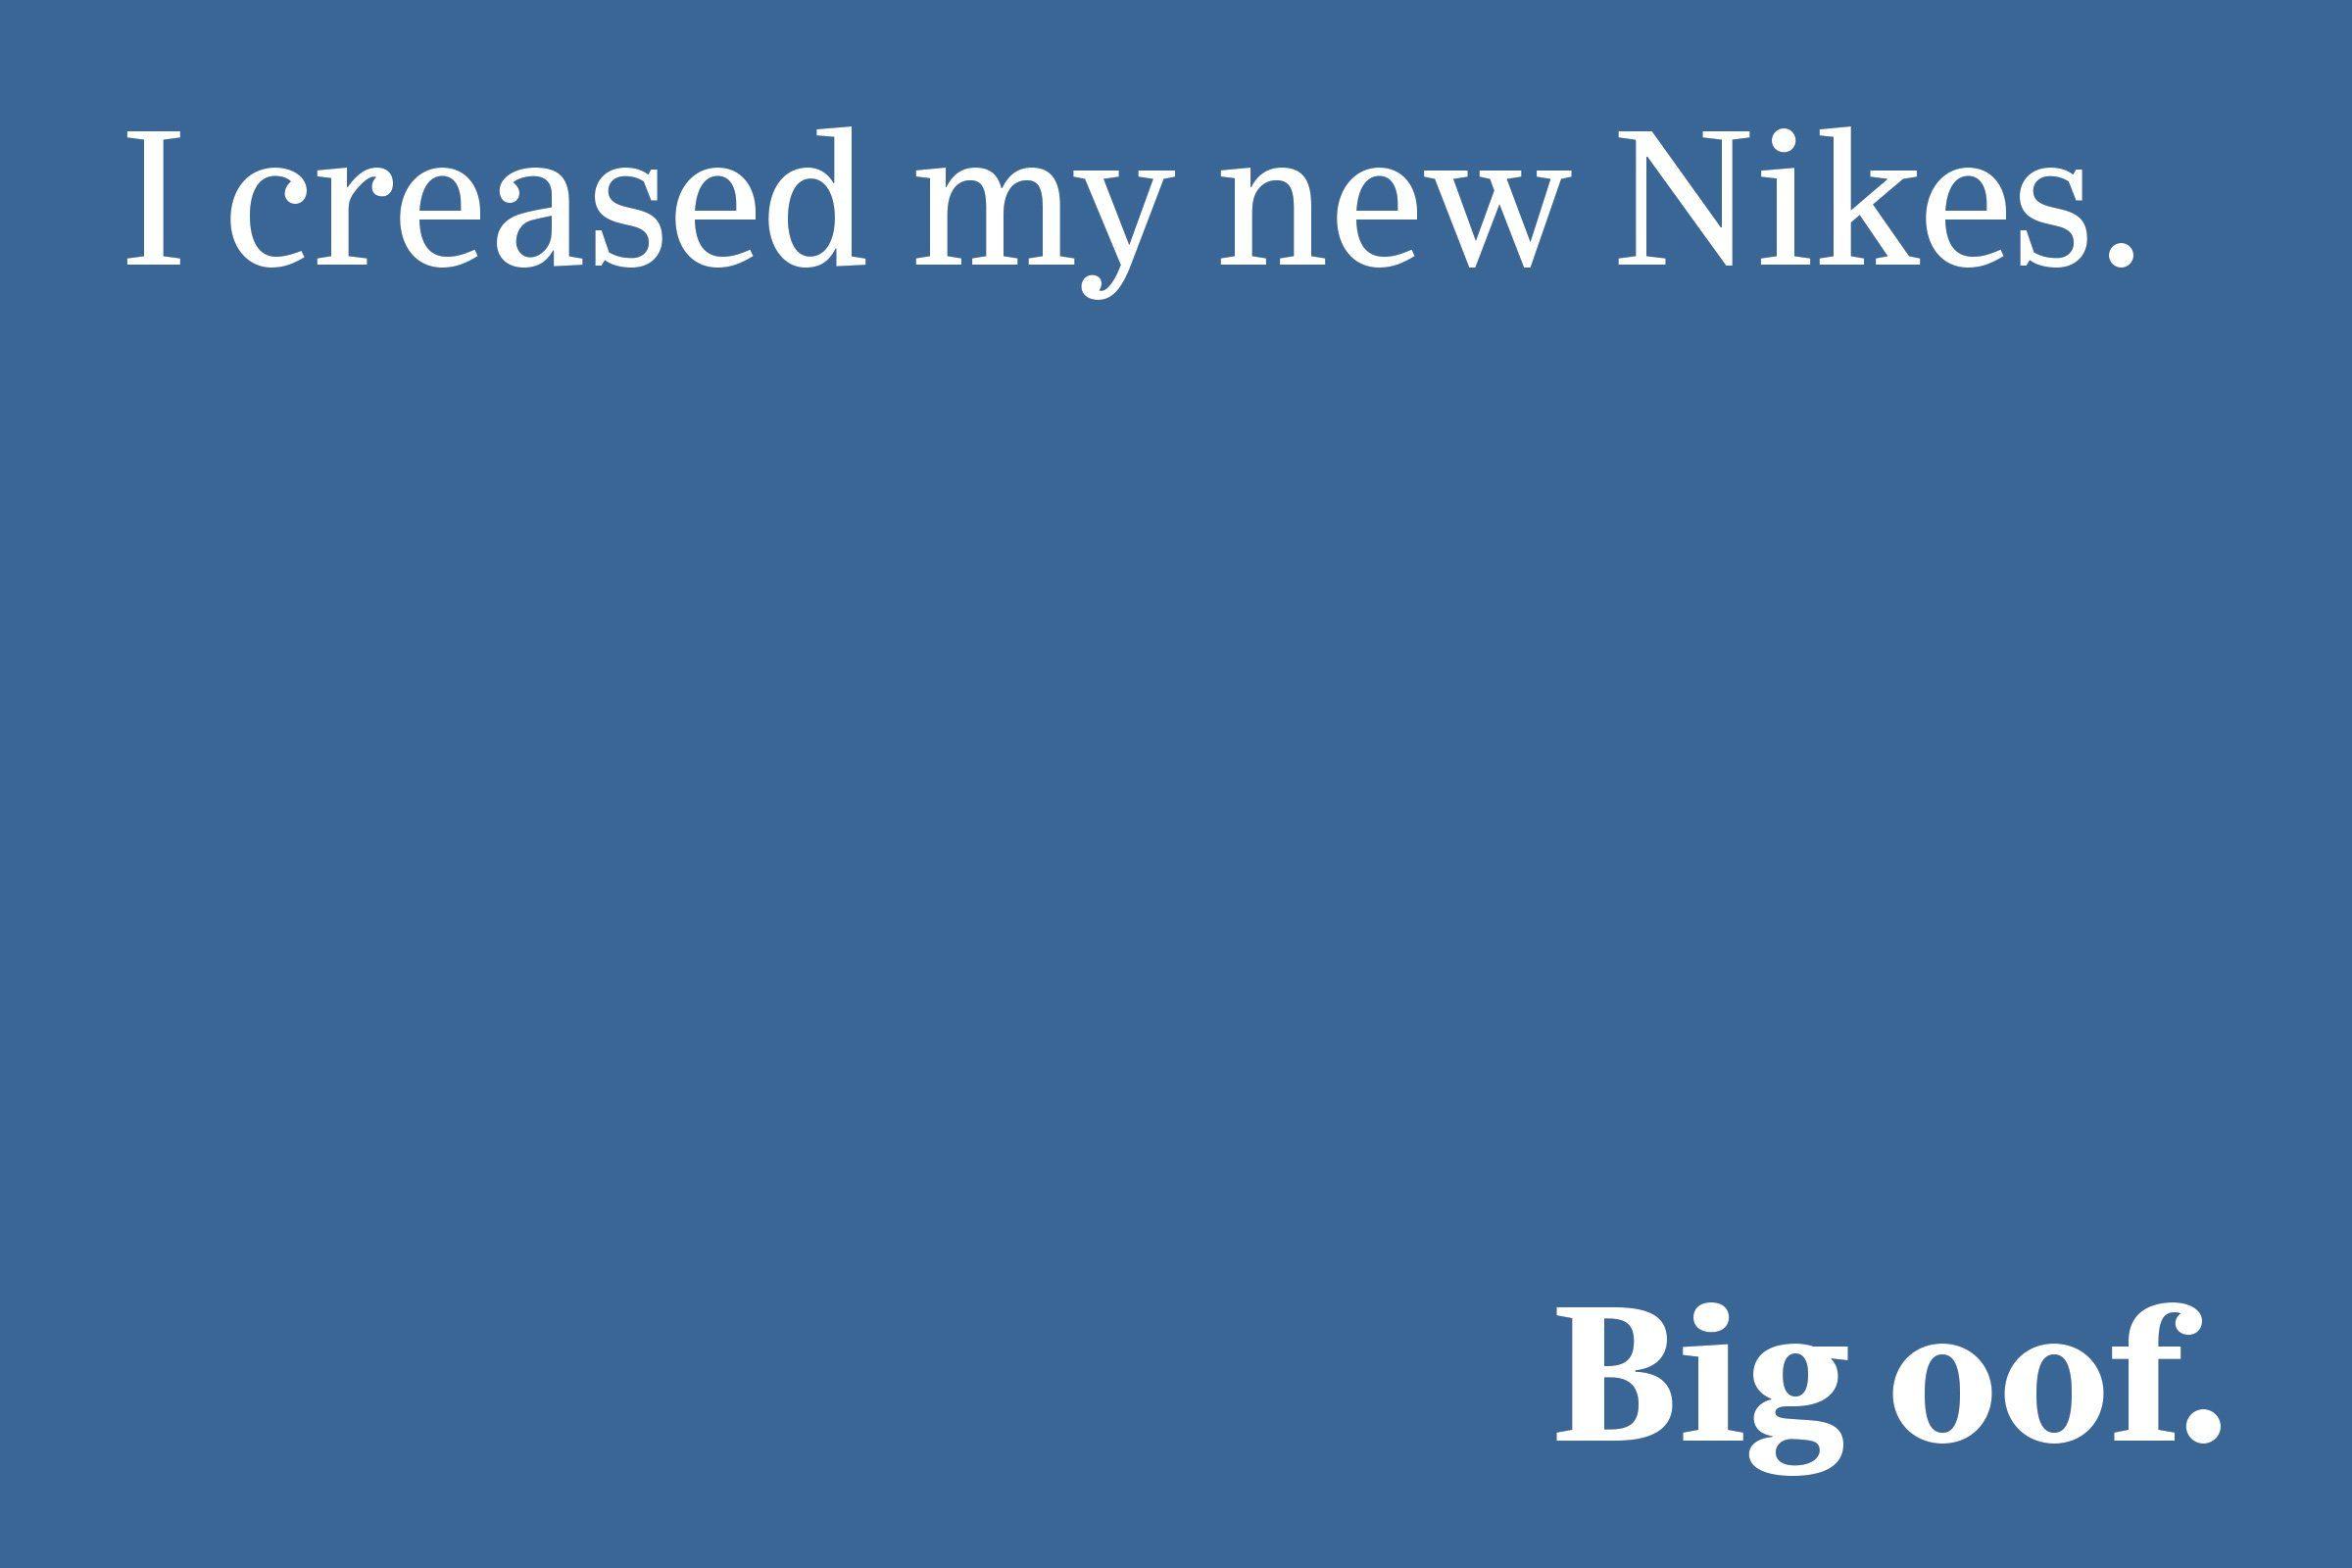 big oof slang 2020